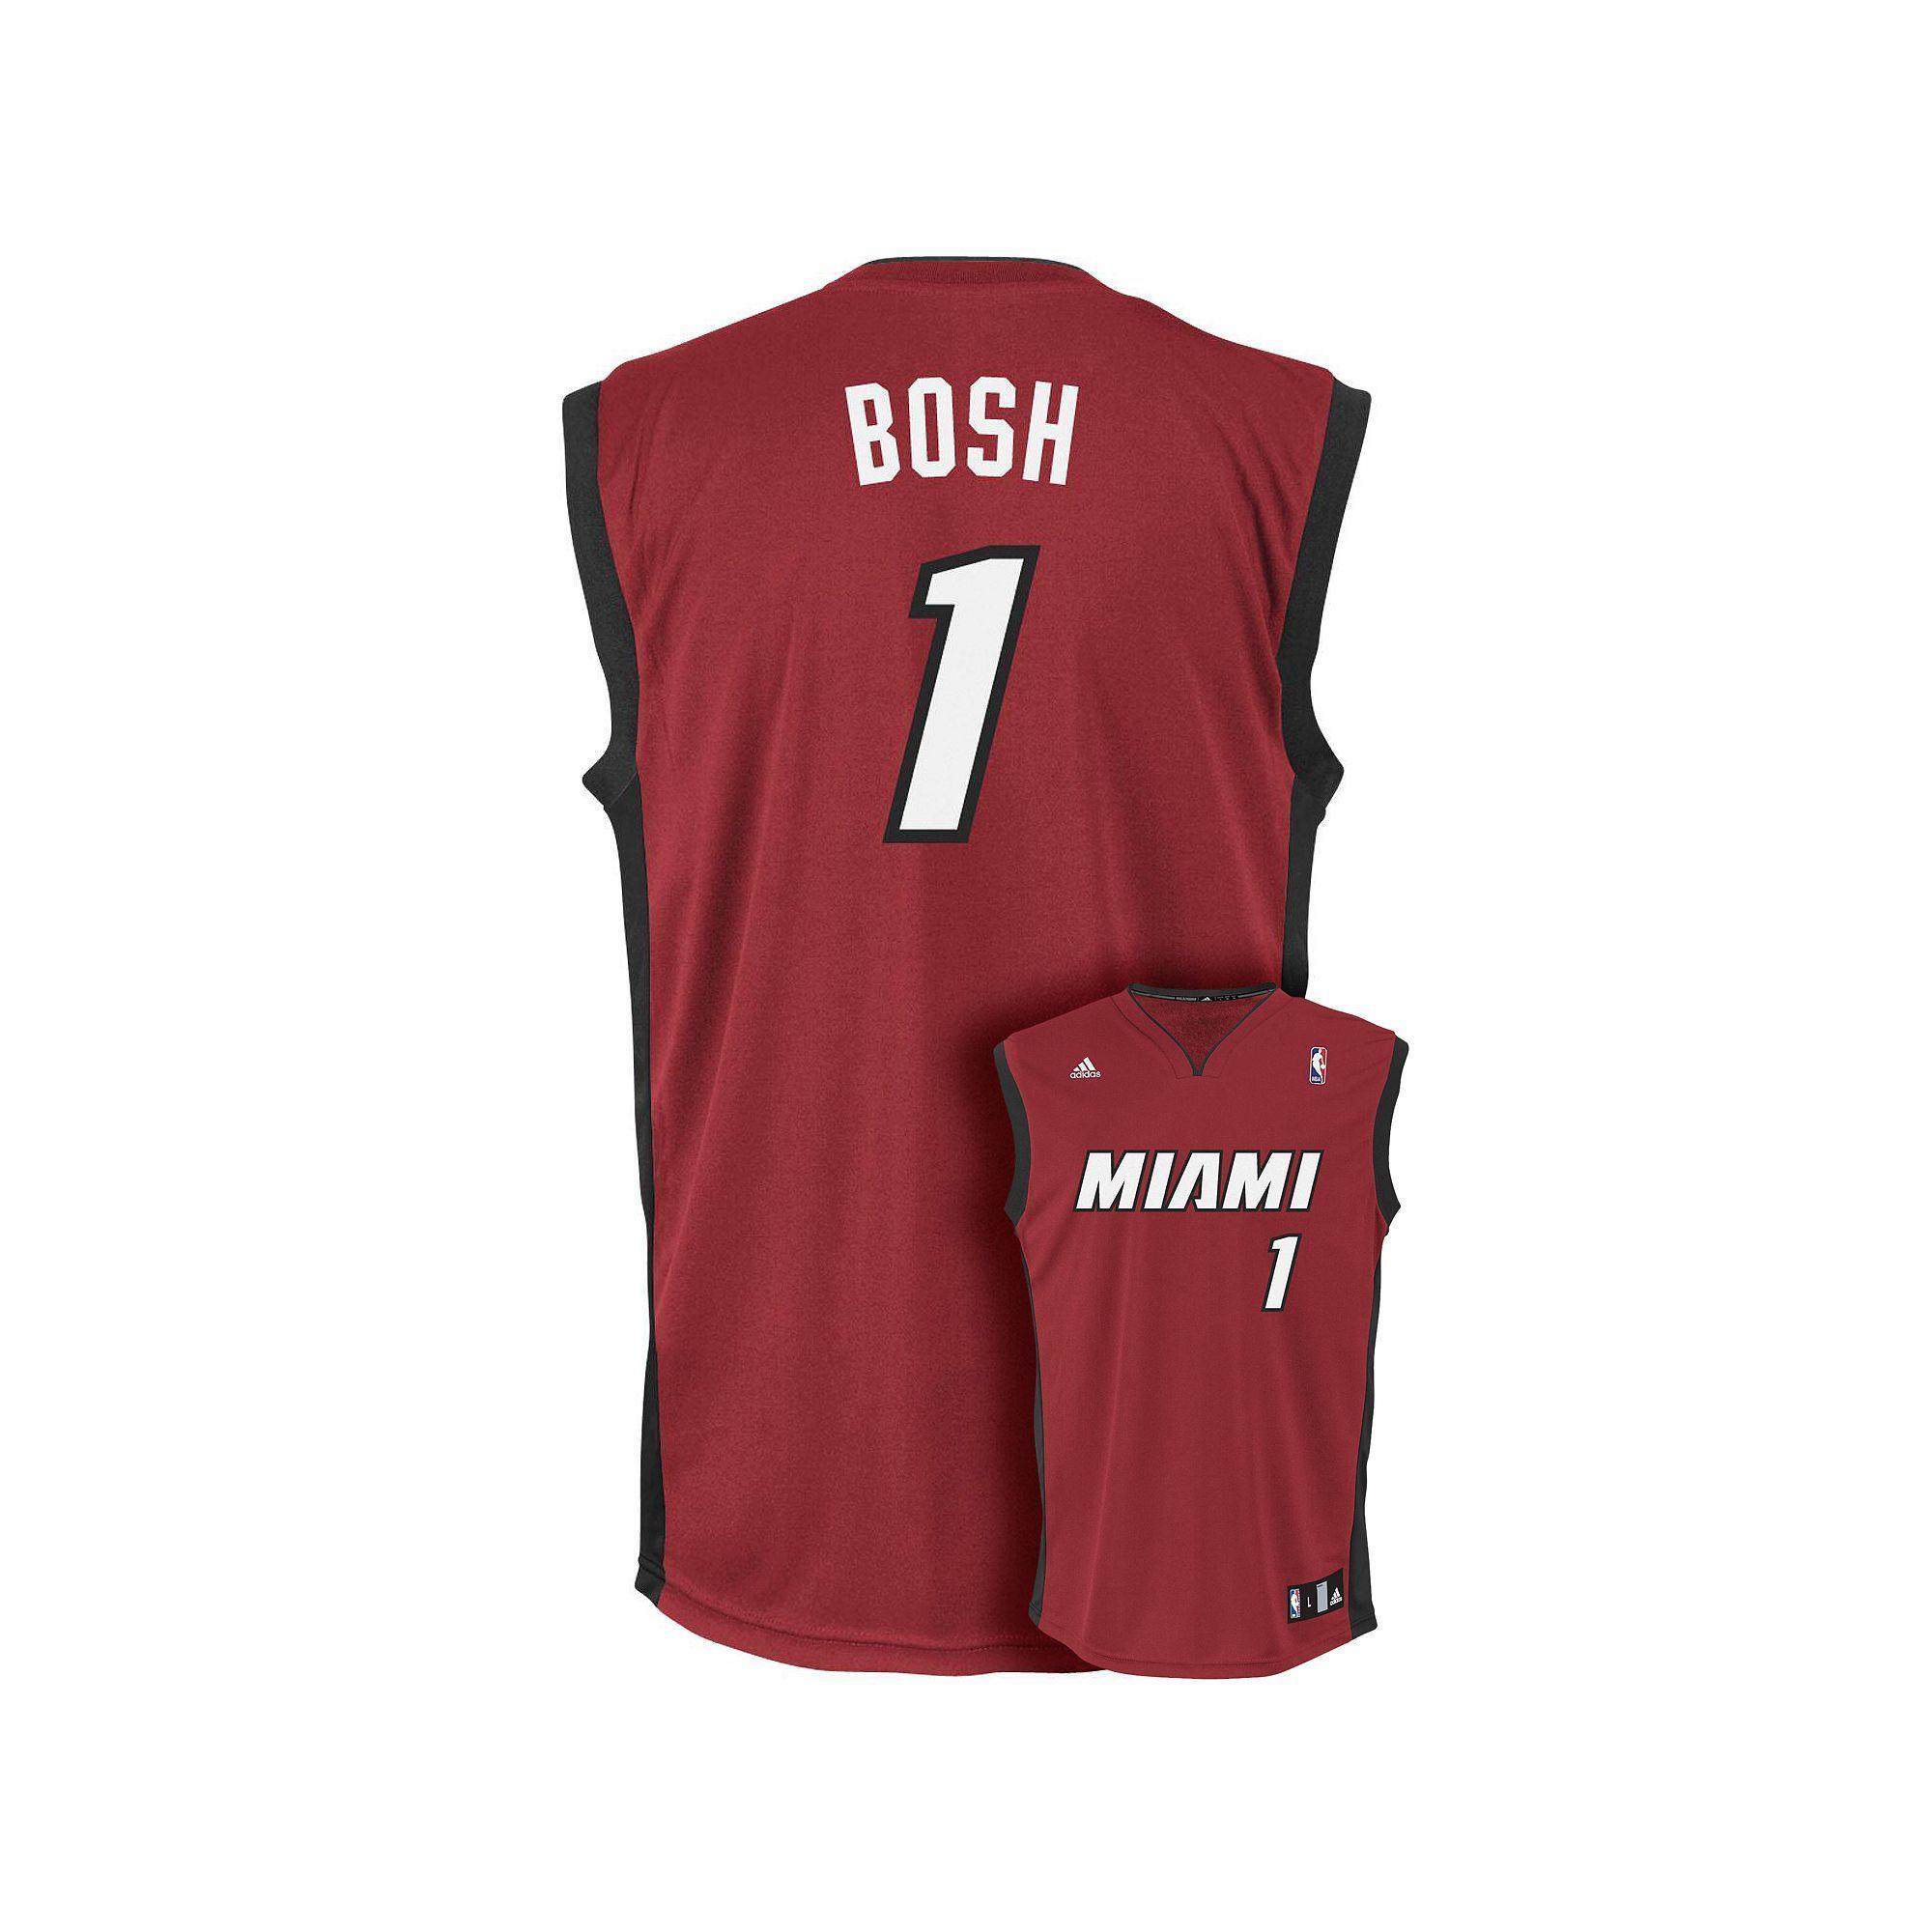 super popular bfbbd 5b990 adidas Miami Heat Chris Bosh NBA Replica Jersey - Boys 8-20 ...